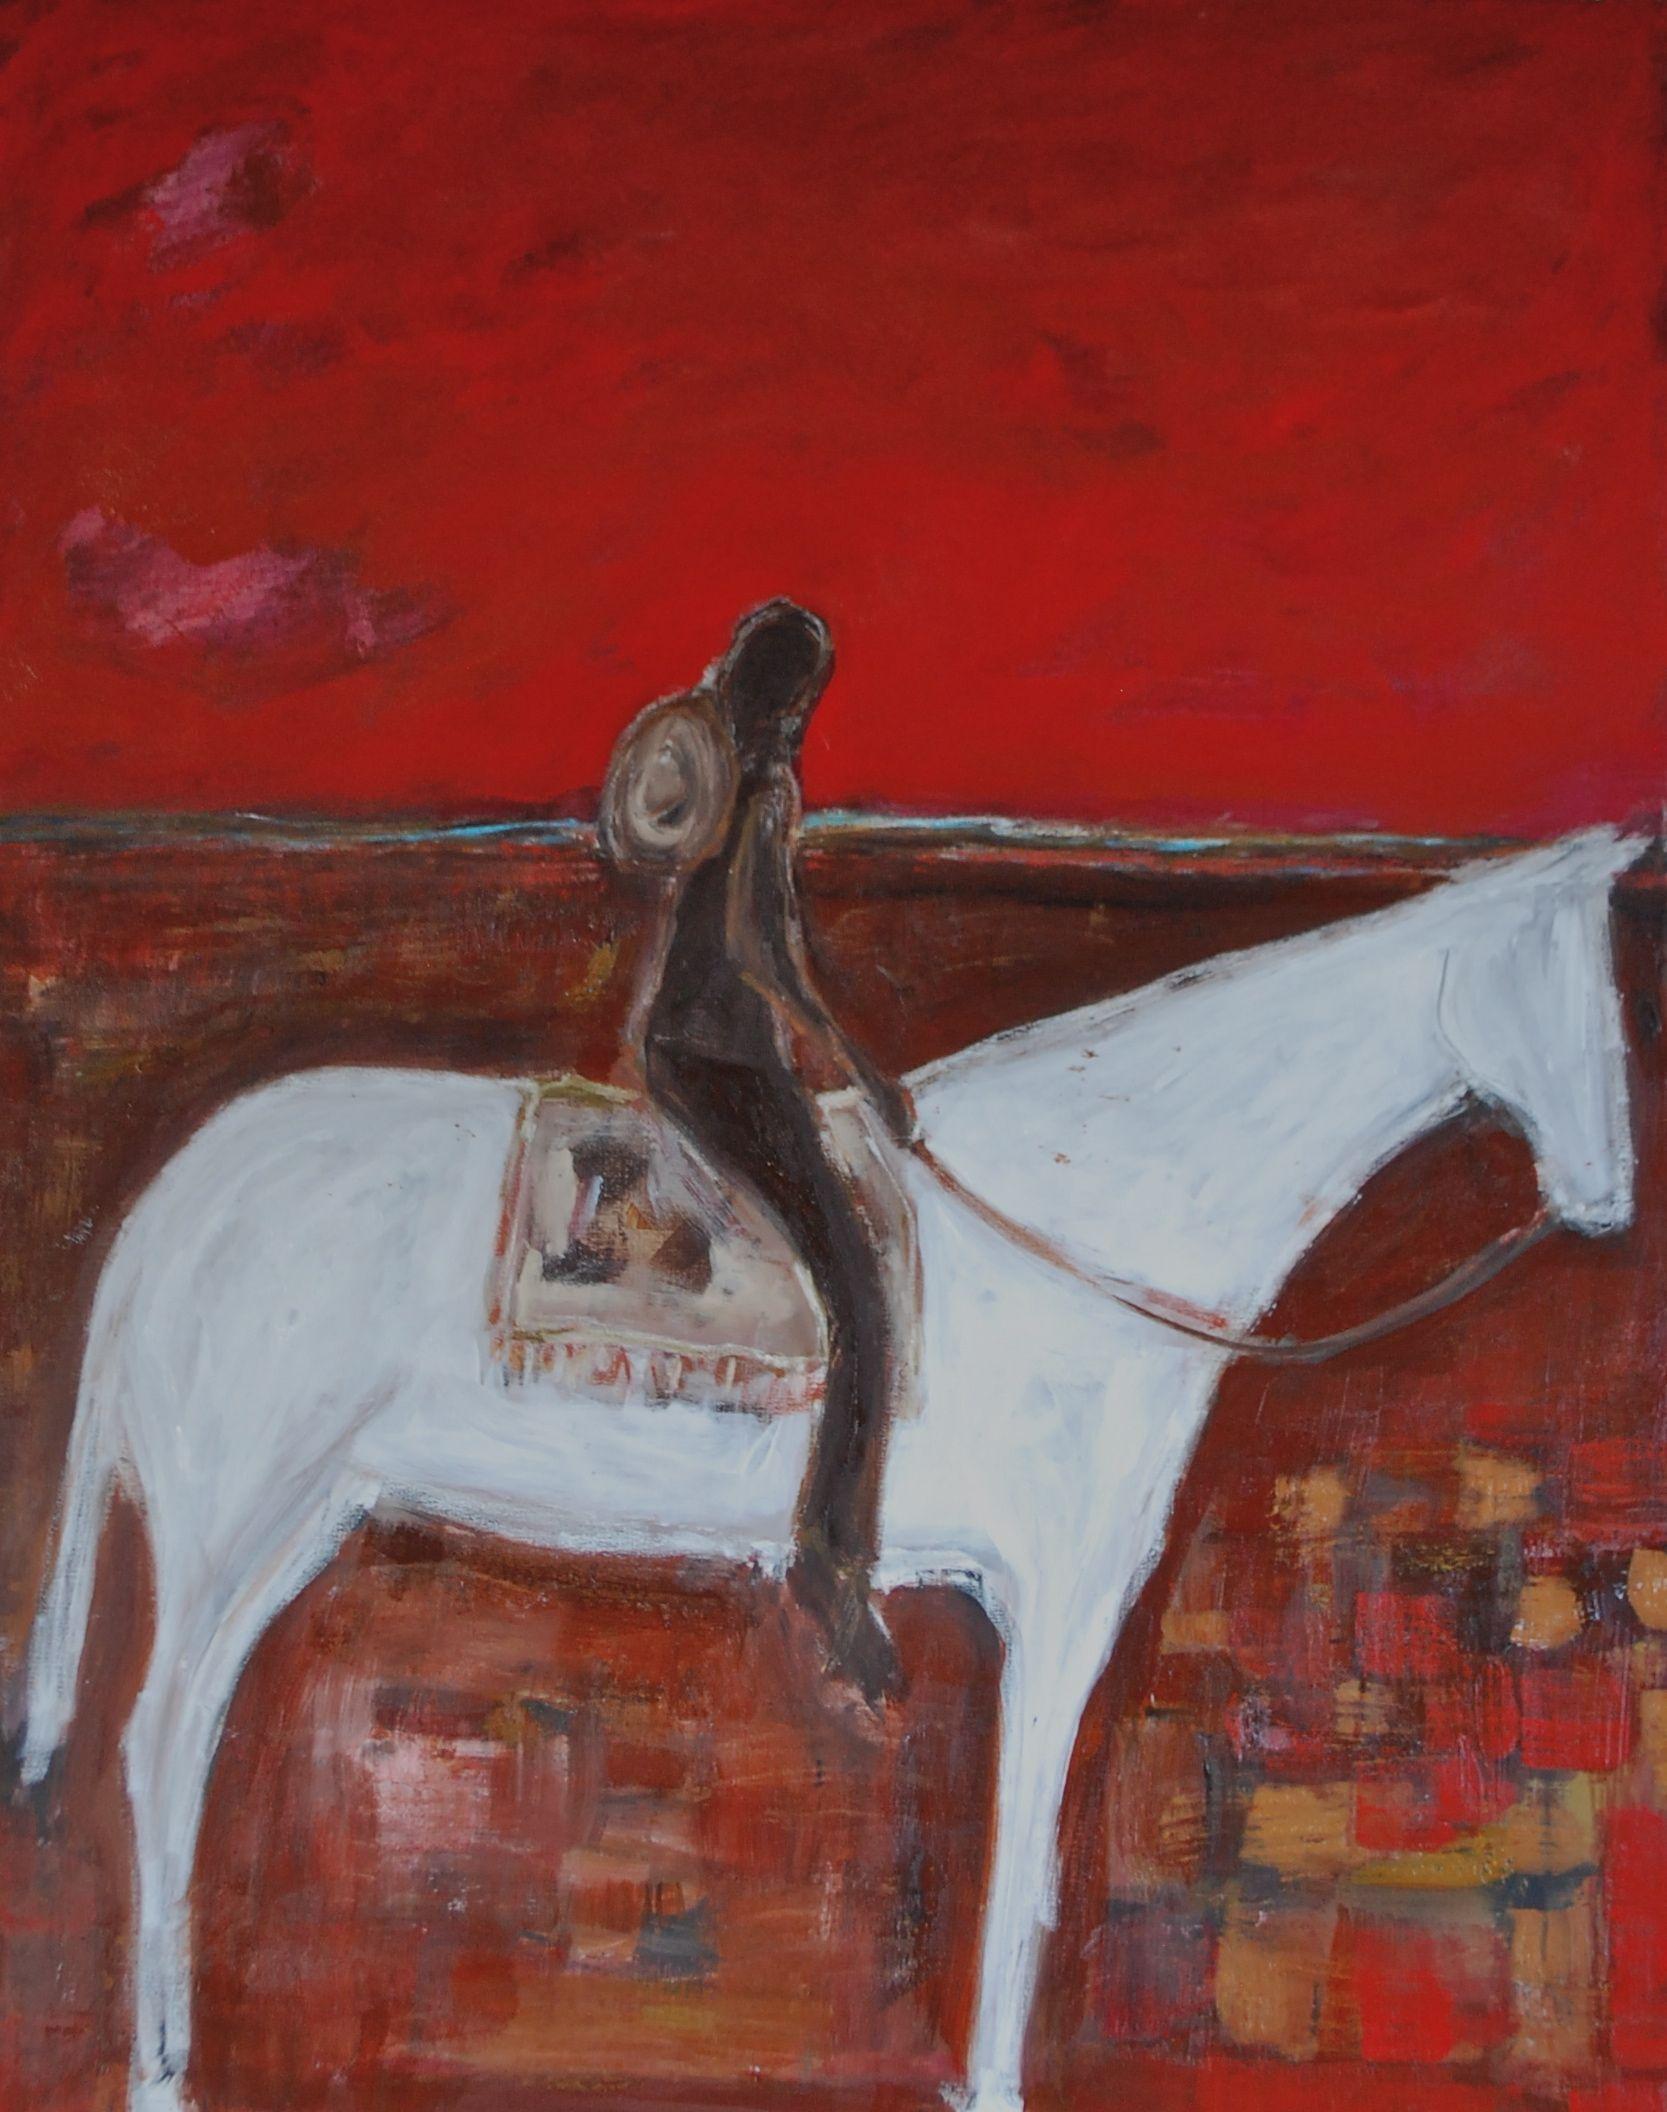 """Red Desert"" by Karen Bezuidenhout www.karenbezuidenhout.com"